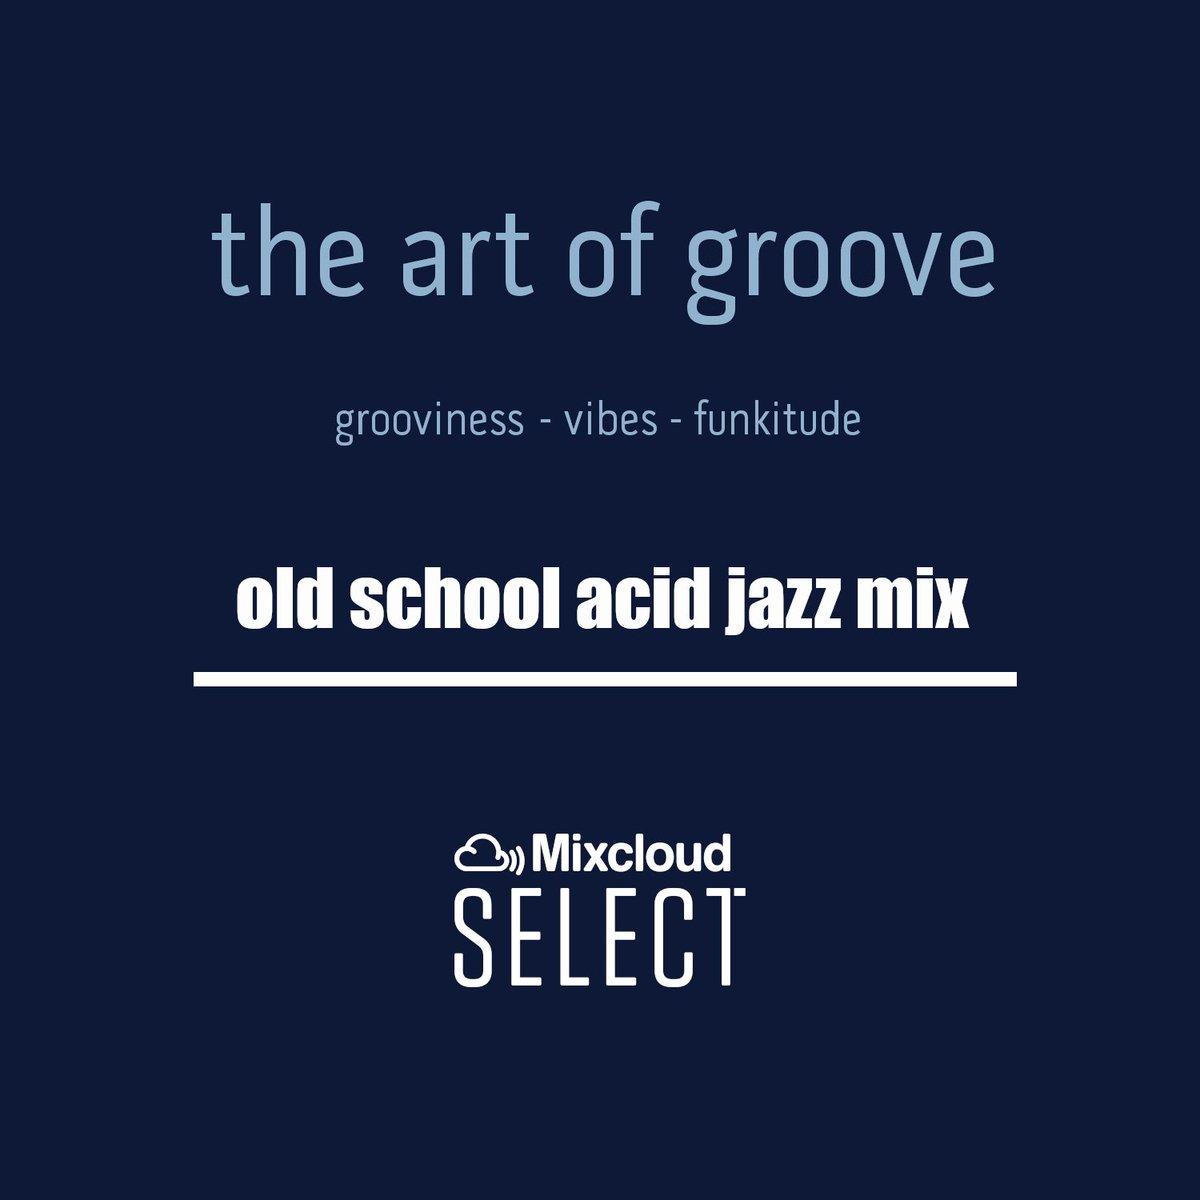 Ronnie Foster, Reuben Wilson, Sonny Stitt, Melvin Sparks just to name a few! On https://t.co/w9xqIsTSVs  enjoy! #MixcloudSelect #GetCloser #nowplaying #nowlistening #souljazz #acidjazz #Mixcloud #groovy #funky #djset #jazzmusic #djsets #holygrail #instrumental #artofgroove #jazz https://t.co/UWn86828wk